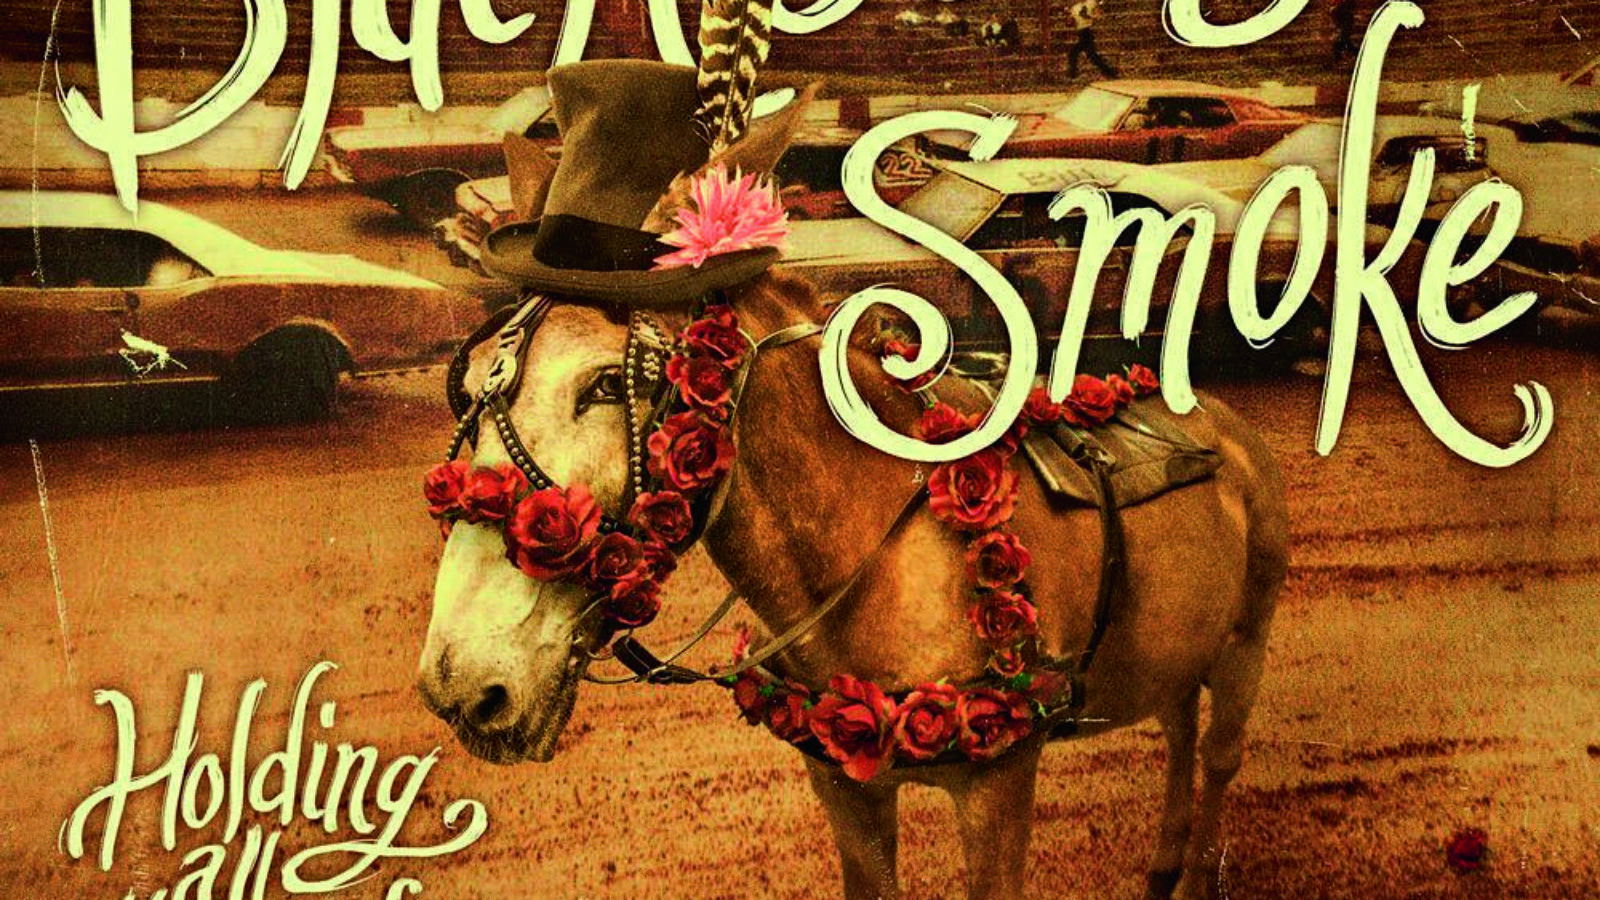 BLACKBERRY SMOKE – Holding All The Roses